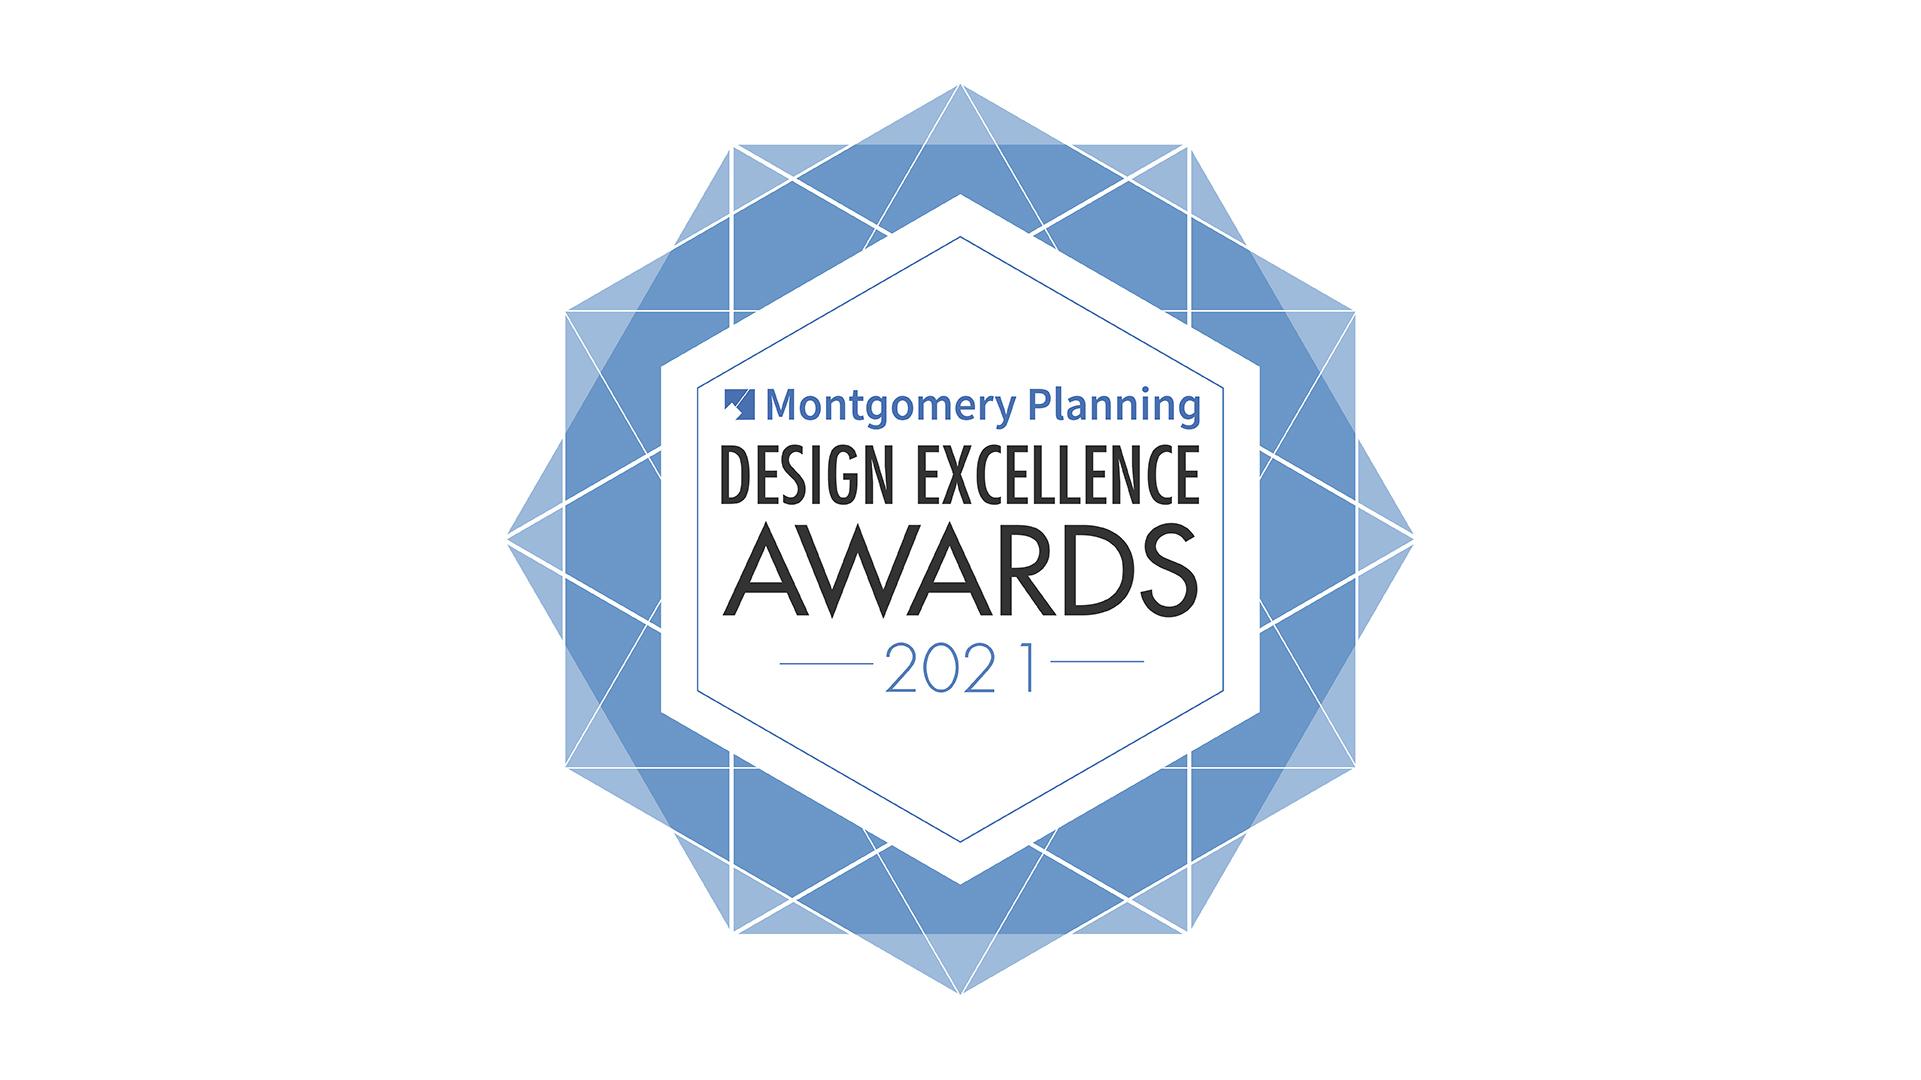 design excellence awards